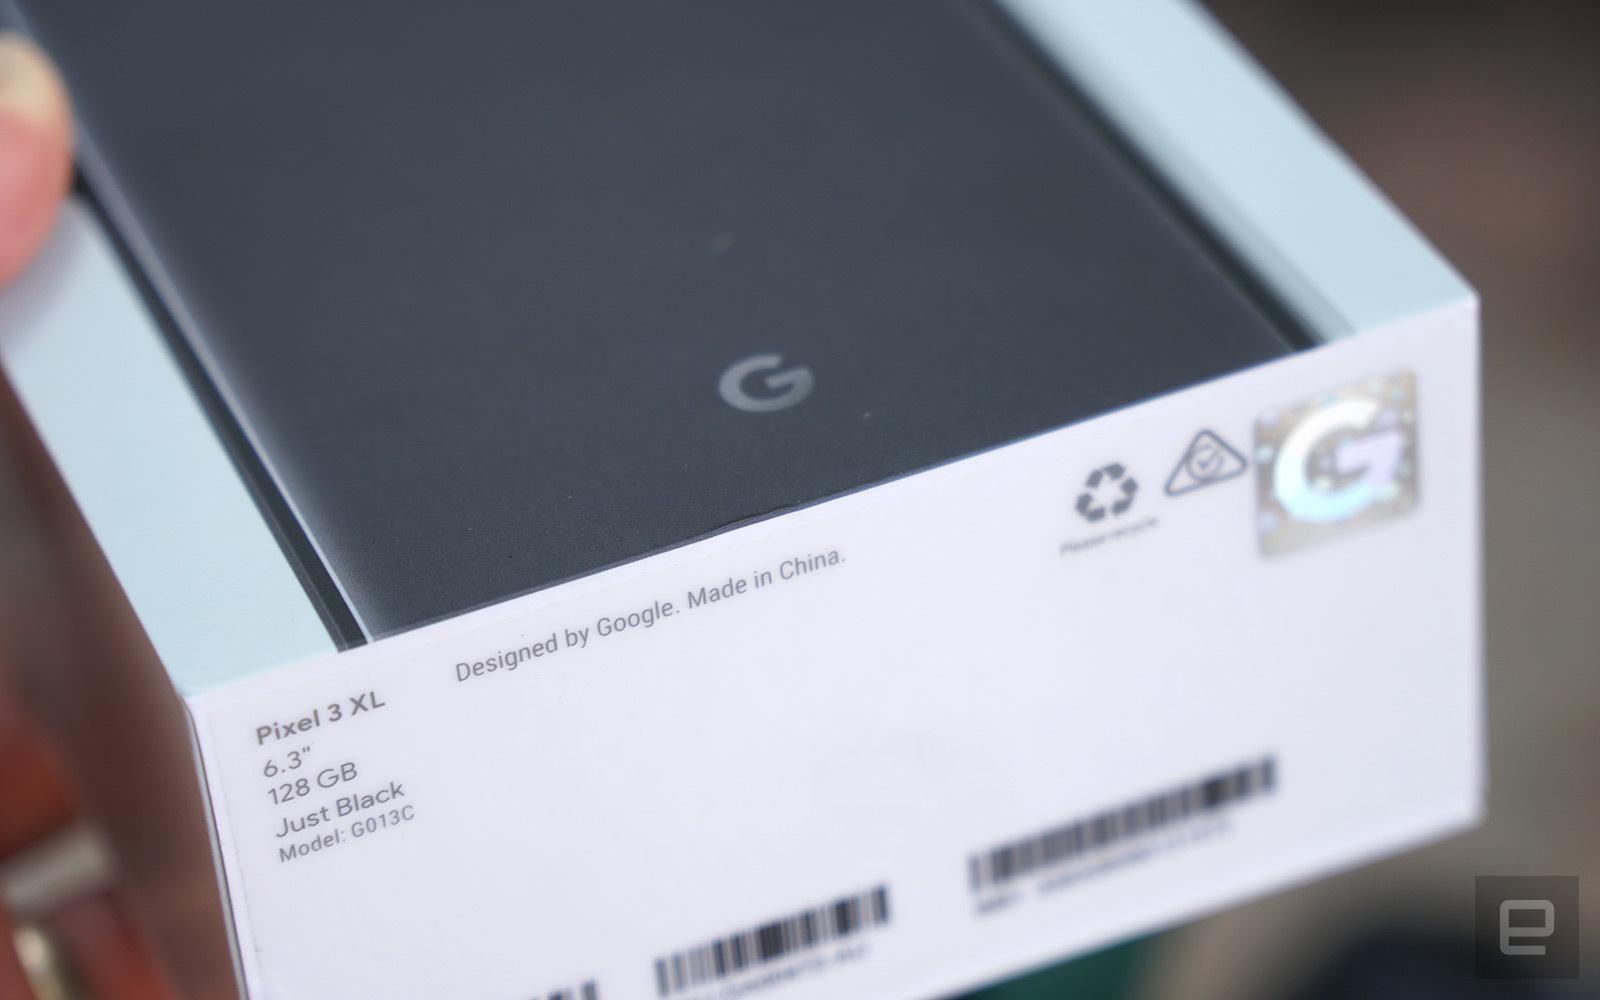 Pixel 3 XL上手:刘海屏前置双摄,搭载骁龙845